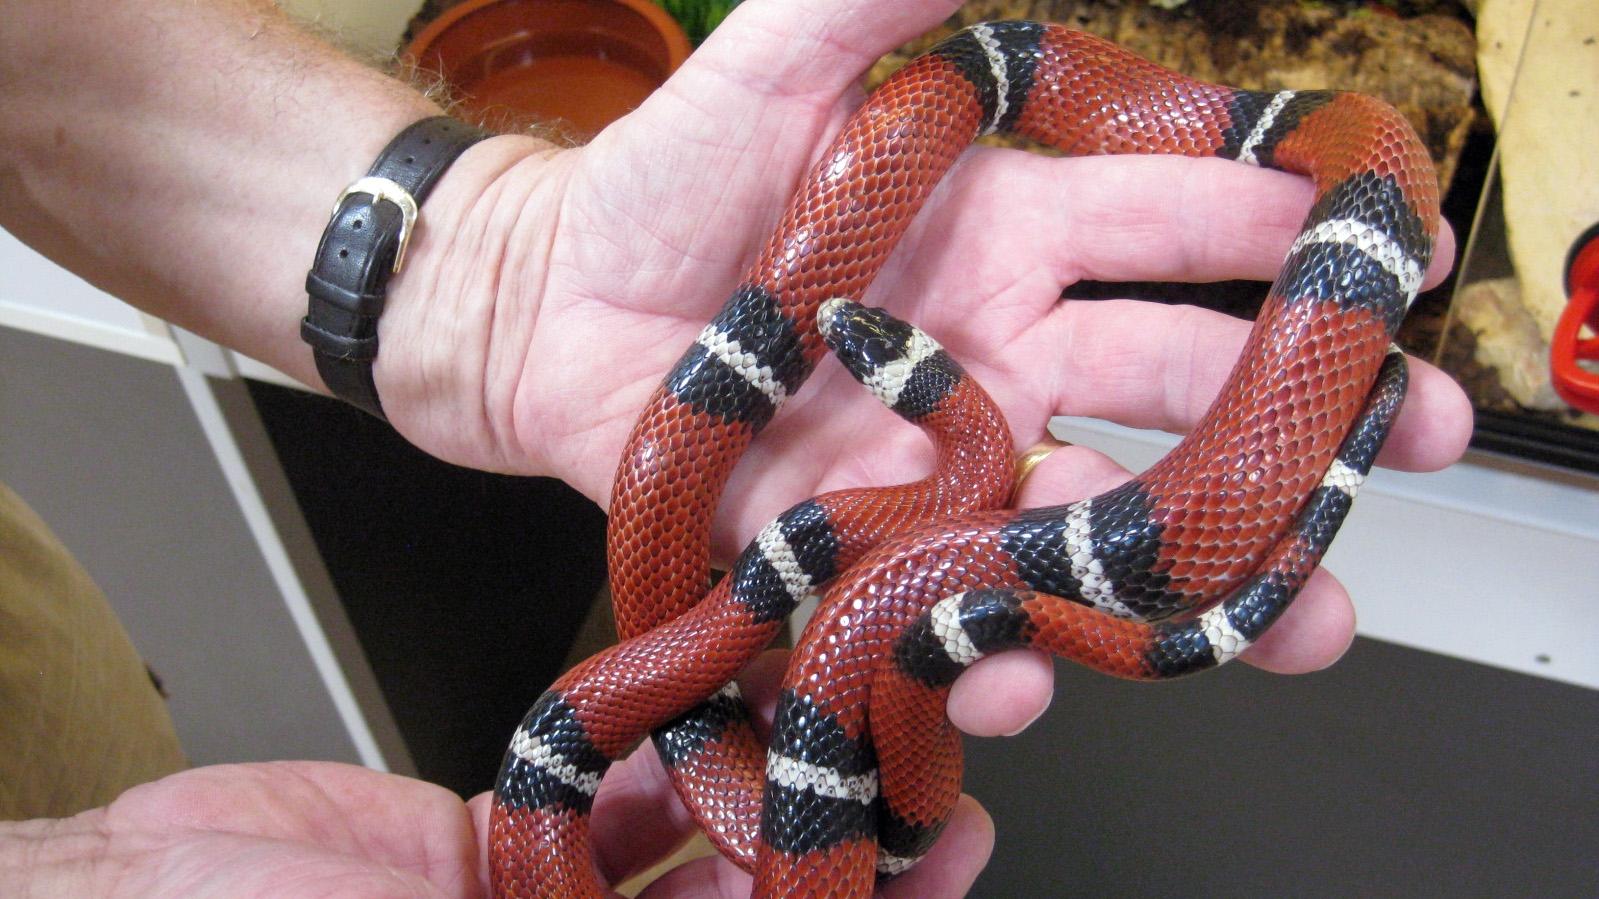 Schlangen hautnah erleben